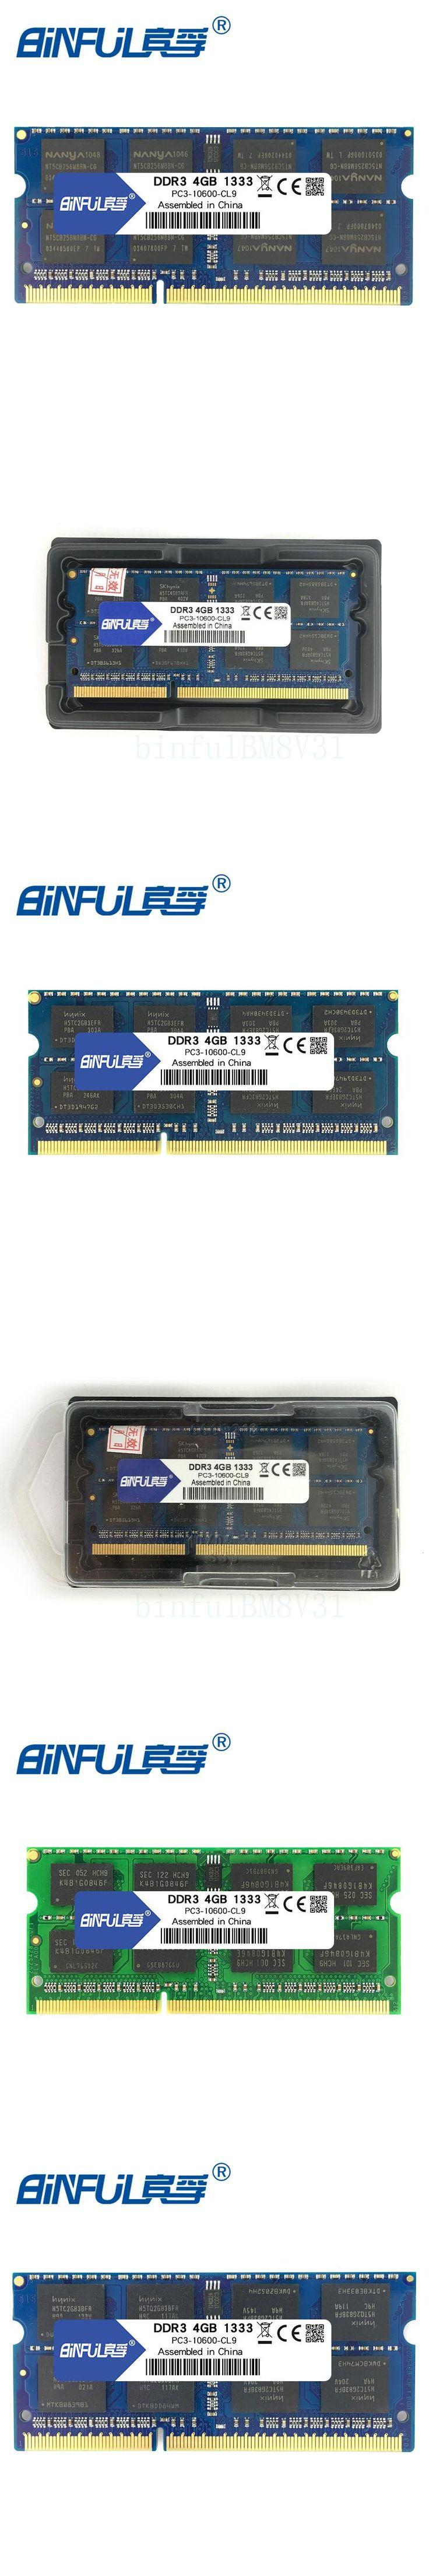 brand new original Sodimm DDR3  4G 1333mhz PC3-10600 memory 1333mhz for laptop computer netbook lifetime warranty